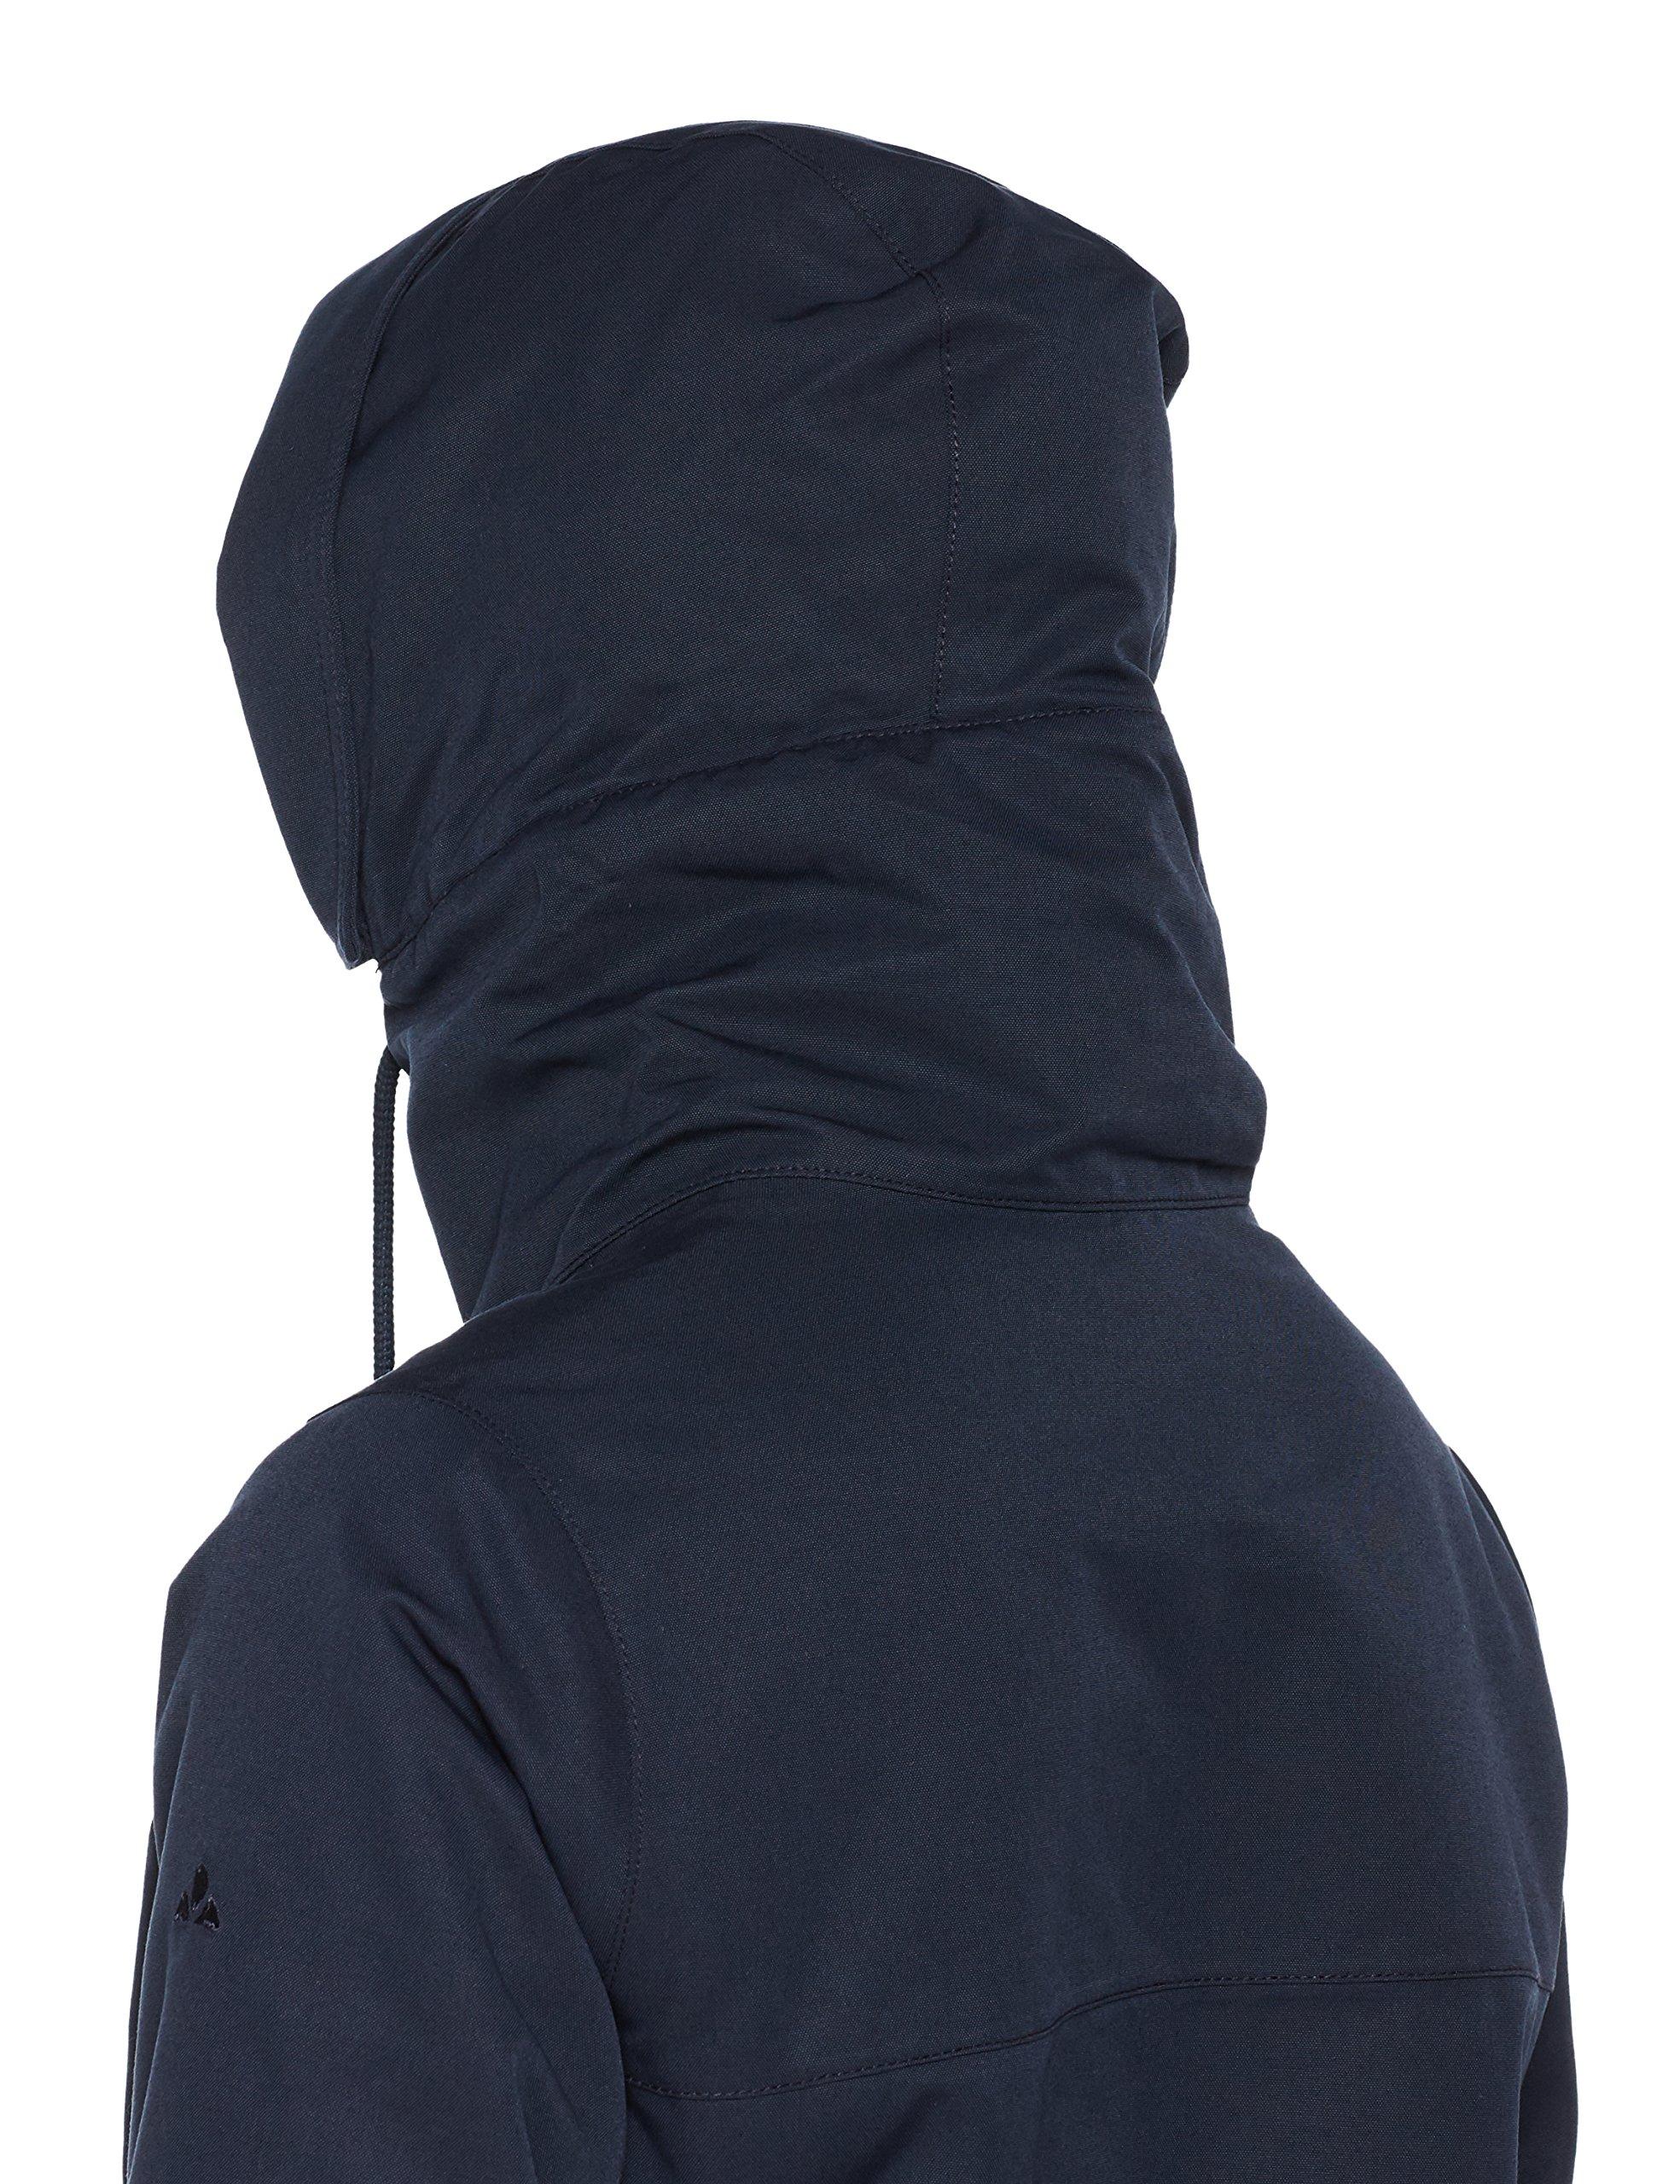 91Ky9IciE L - VAUDE Women's Manukau Jacket